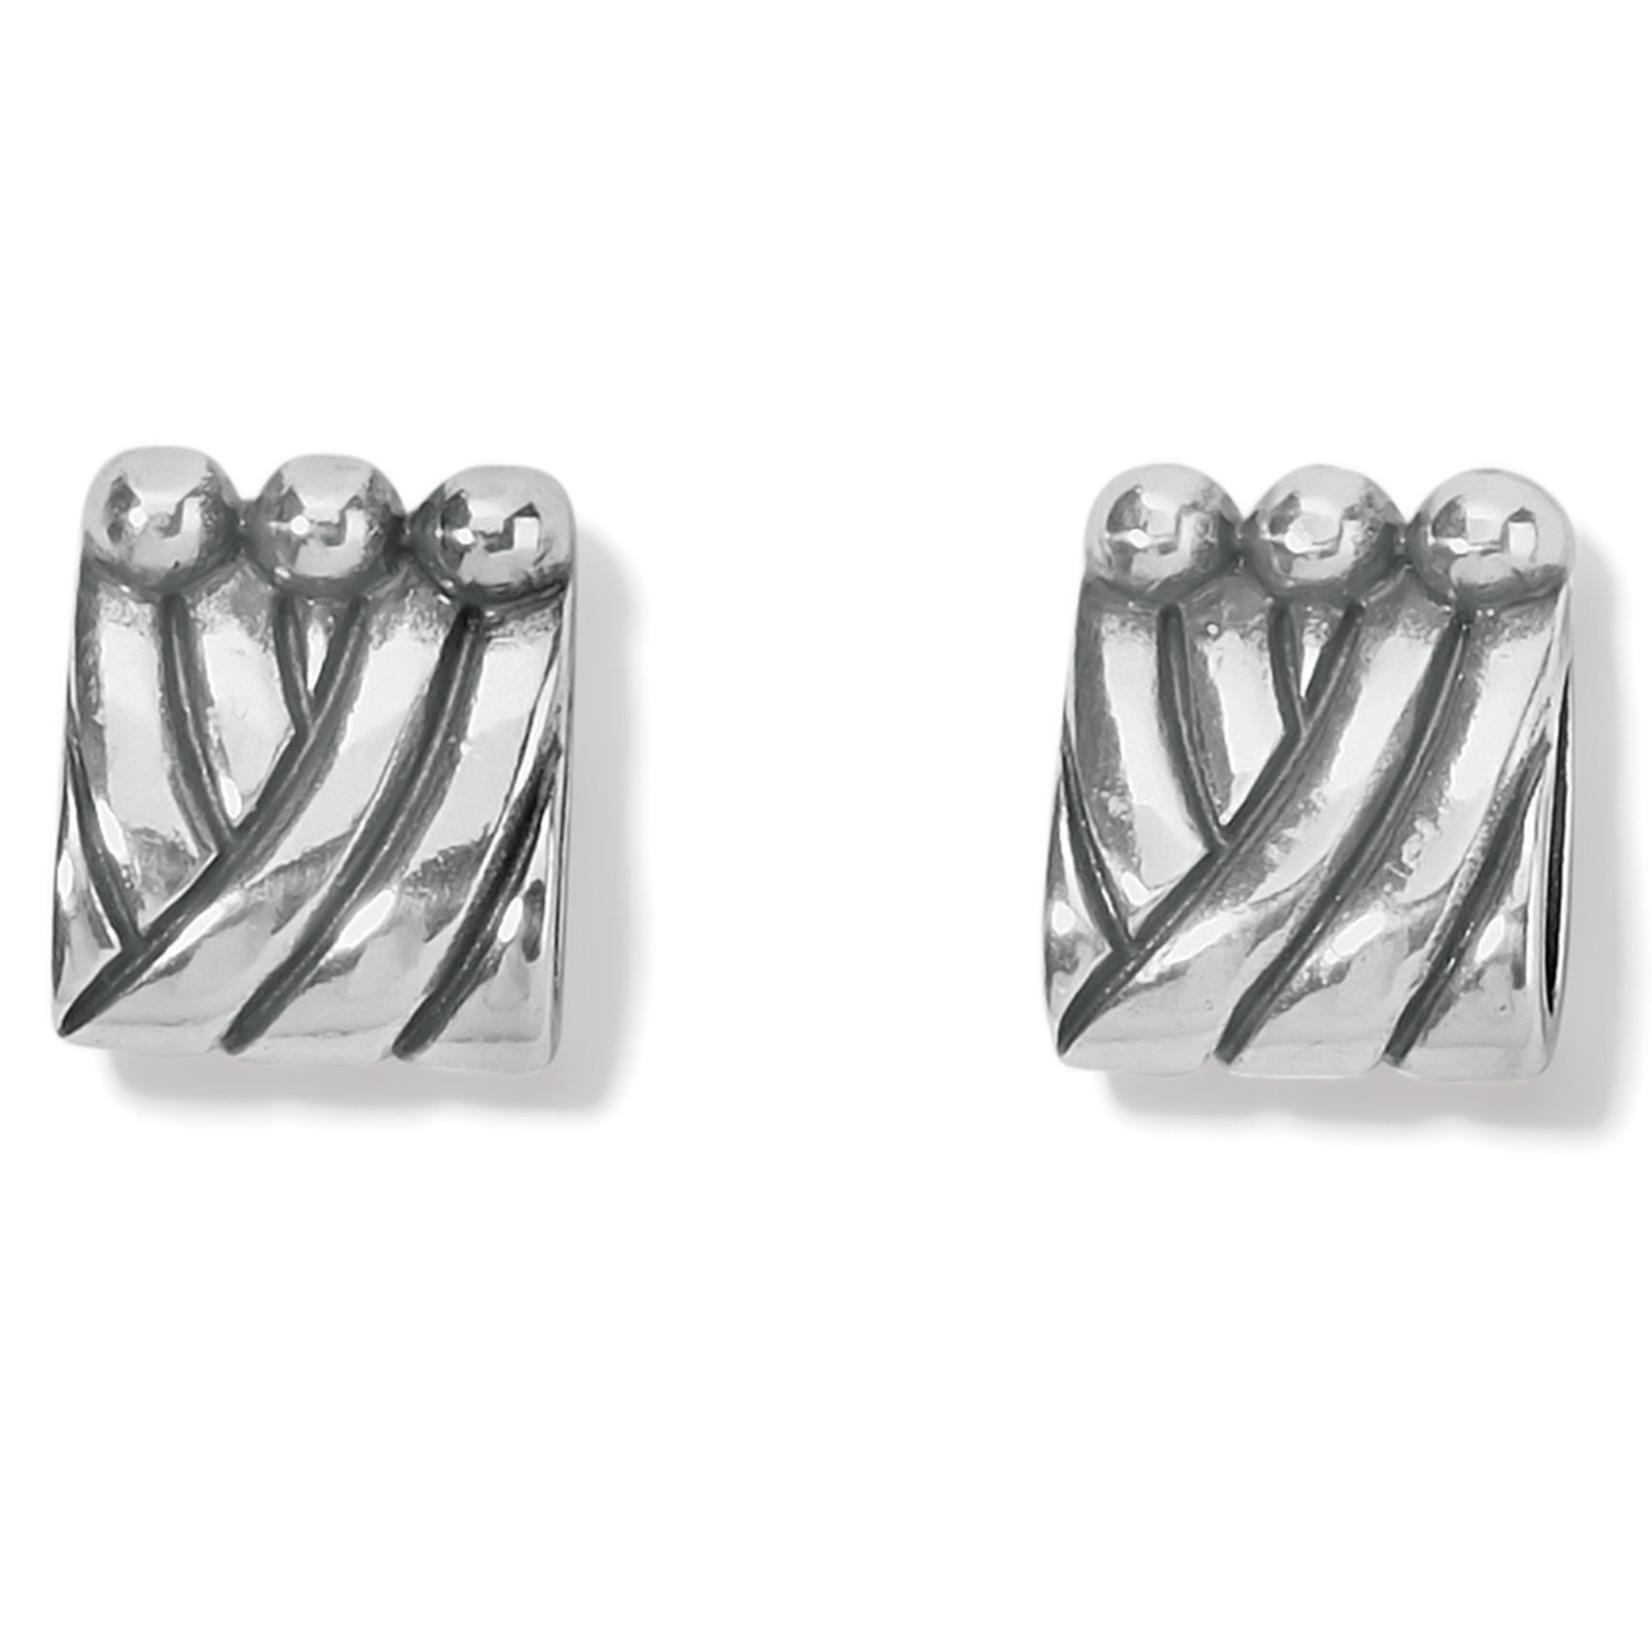 Brighton Sonora Tile Post Earrings - Silver